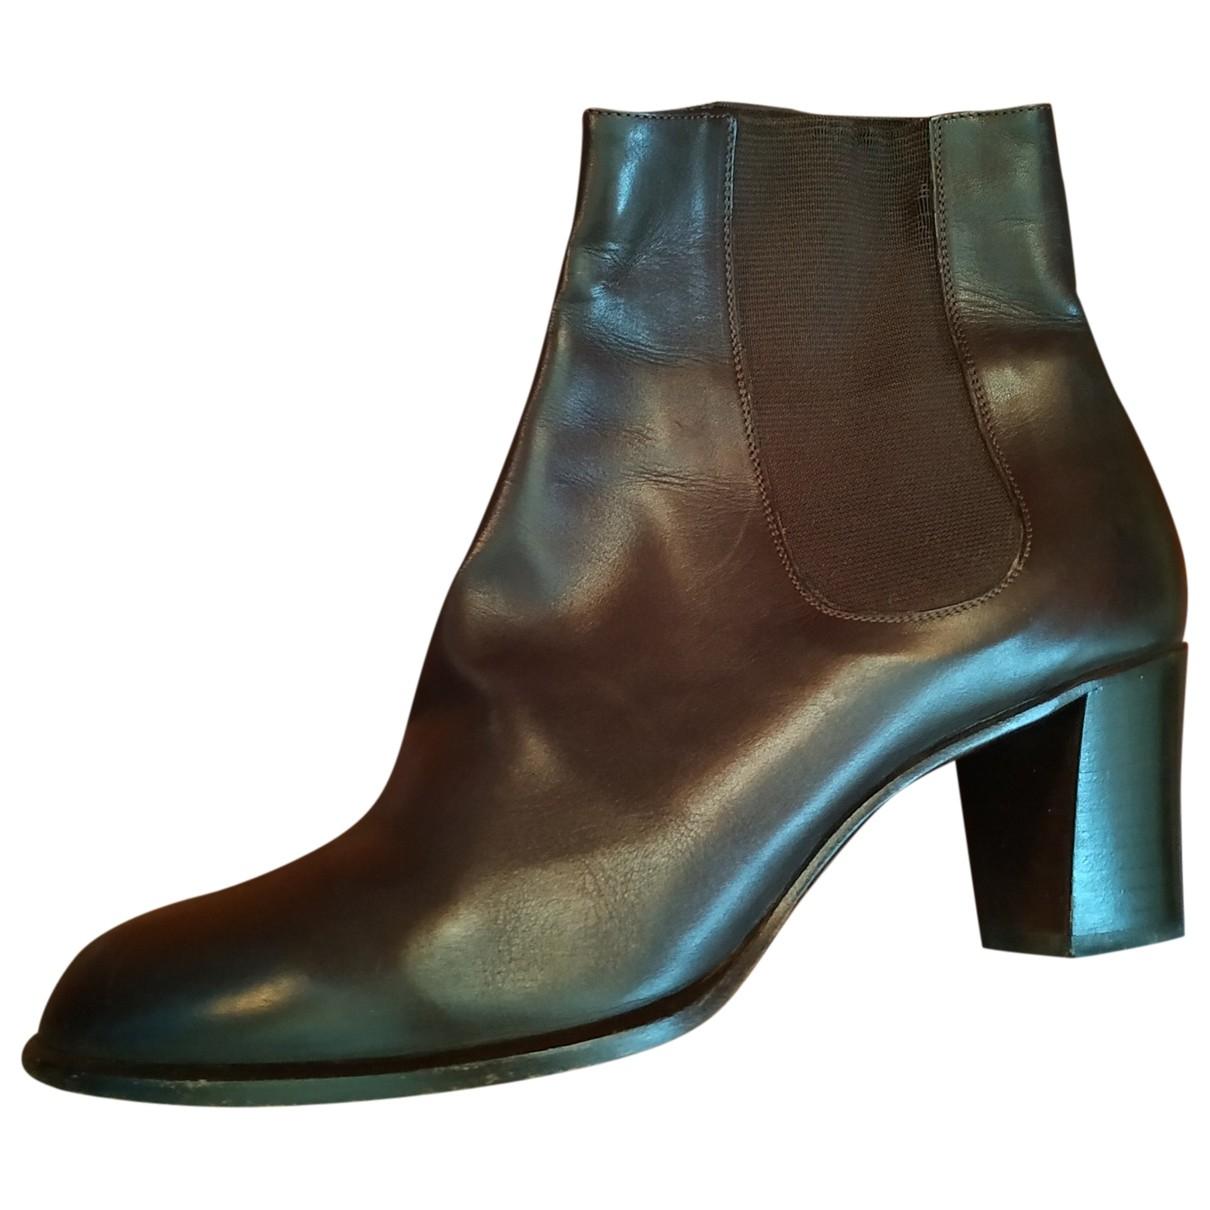 Giorgio Armani - Boots   pour femme en cuir - marron